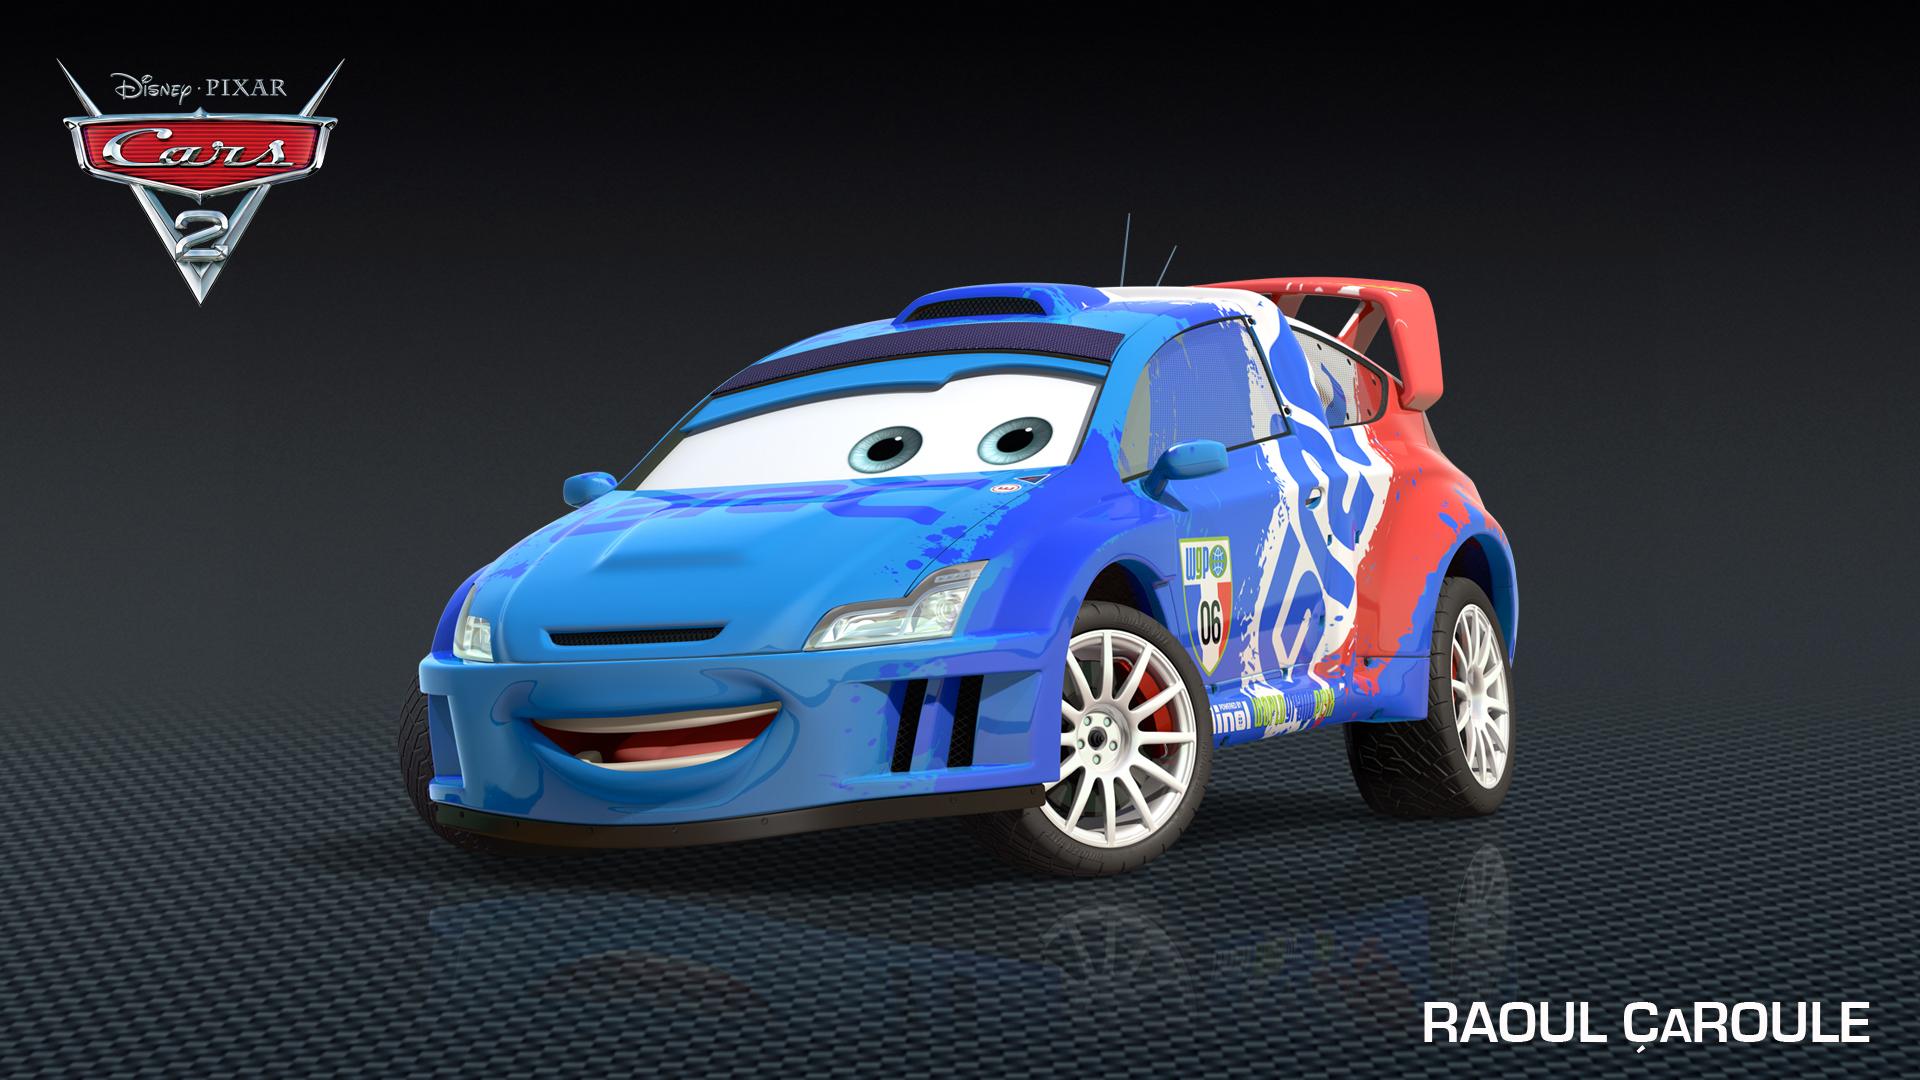 Raoul ÇaRoule Drives Into Cars 2